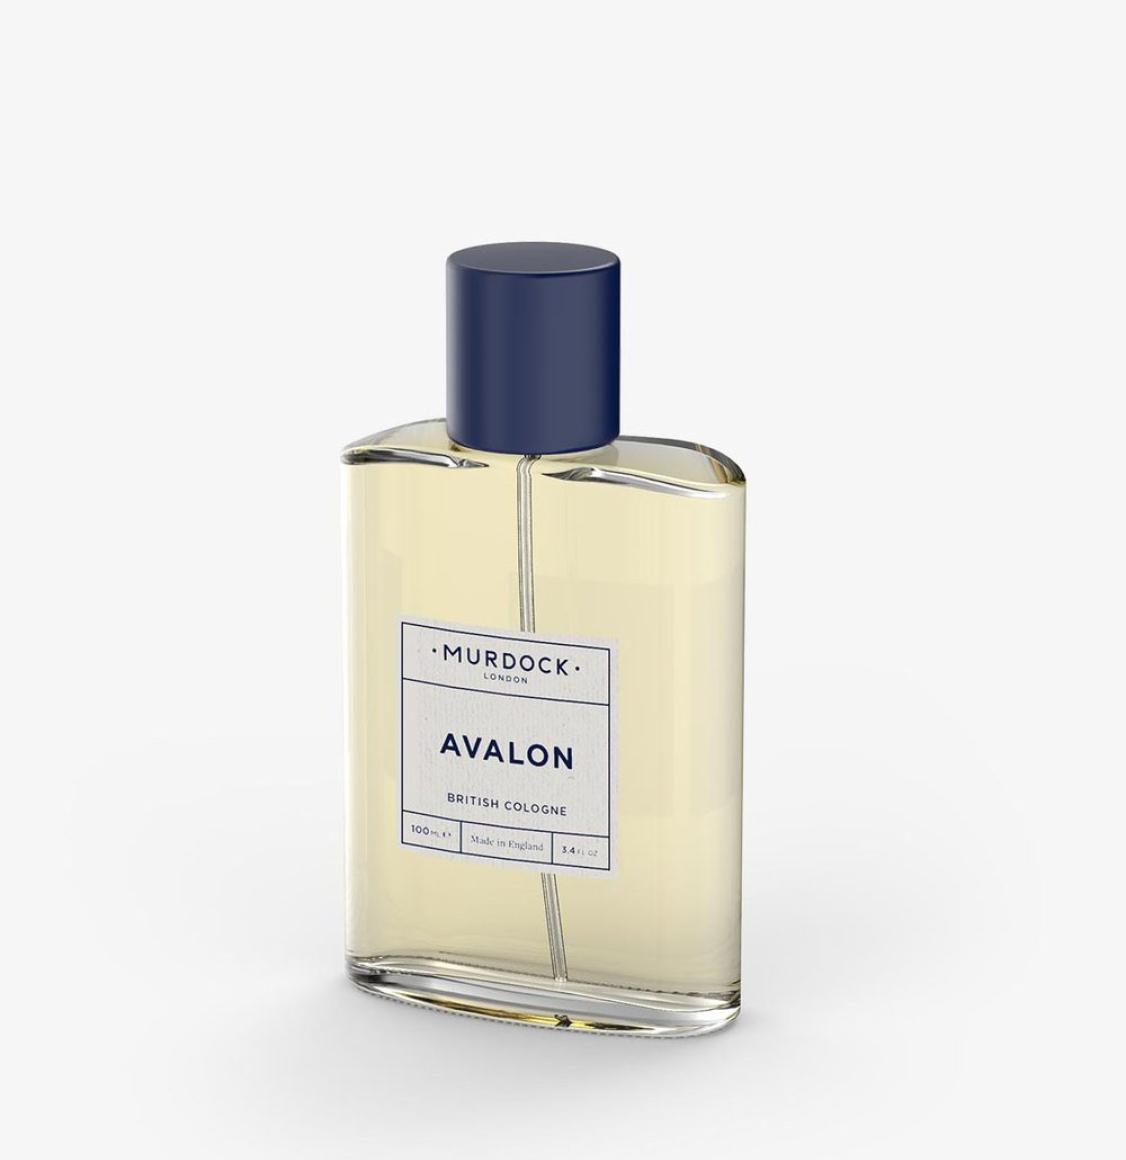 Murdock London Avalon Cologne 100ml